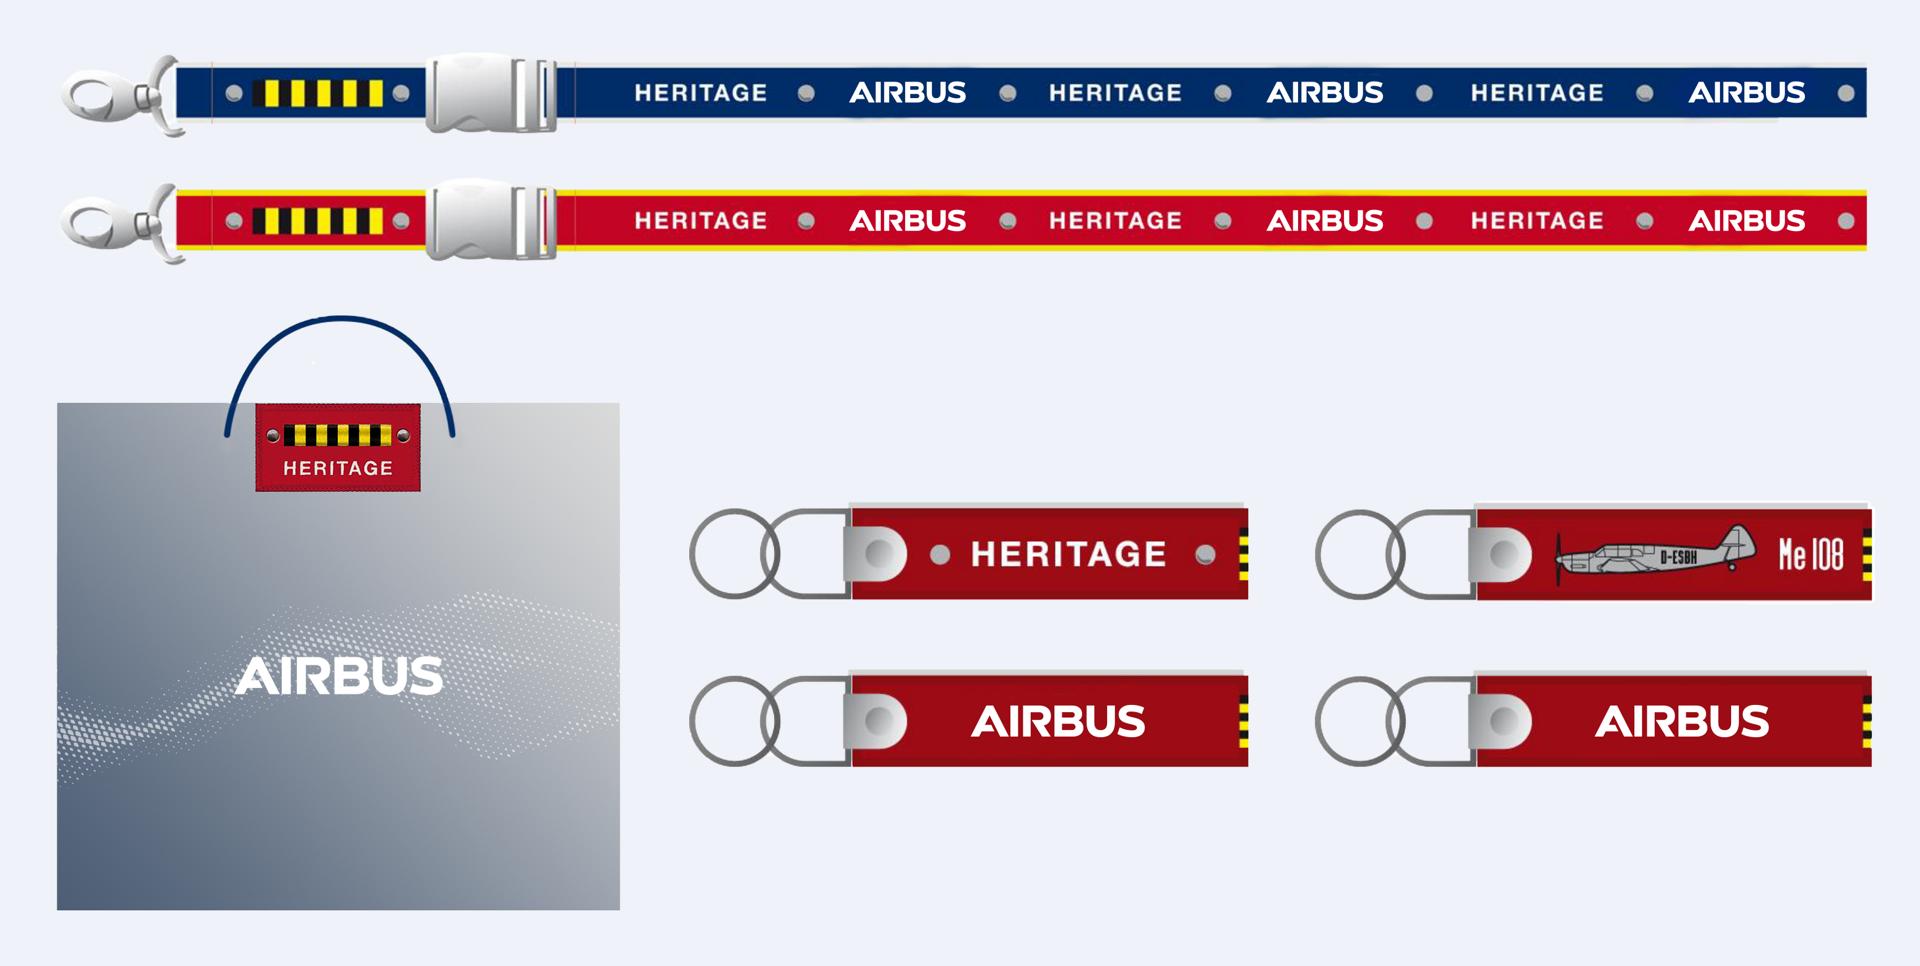 Airbus Heritage Merchandising